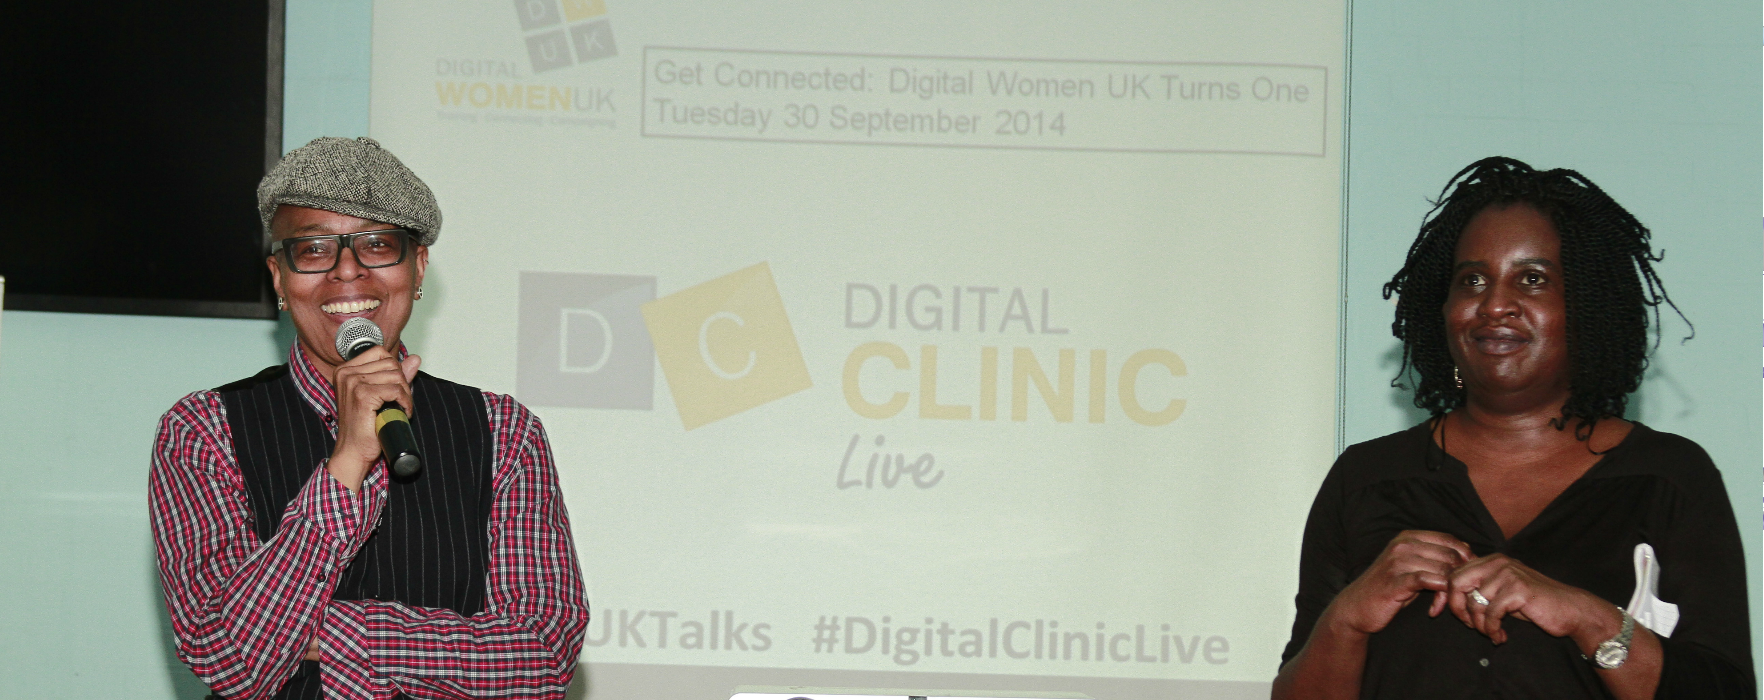 article template - Digital Clinic DWUKTalks